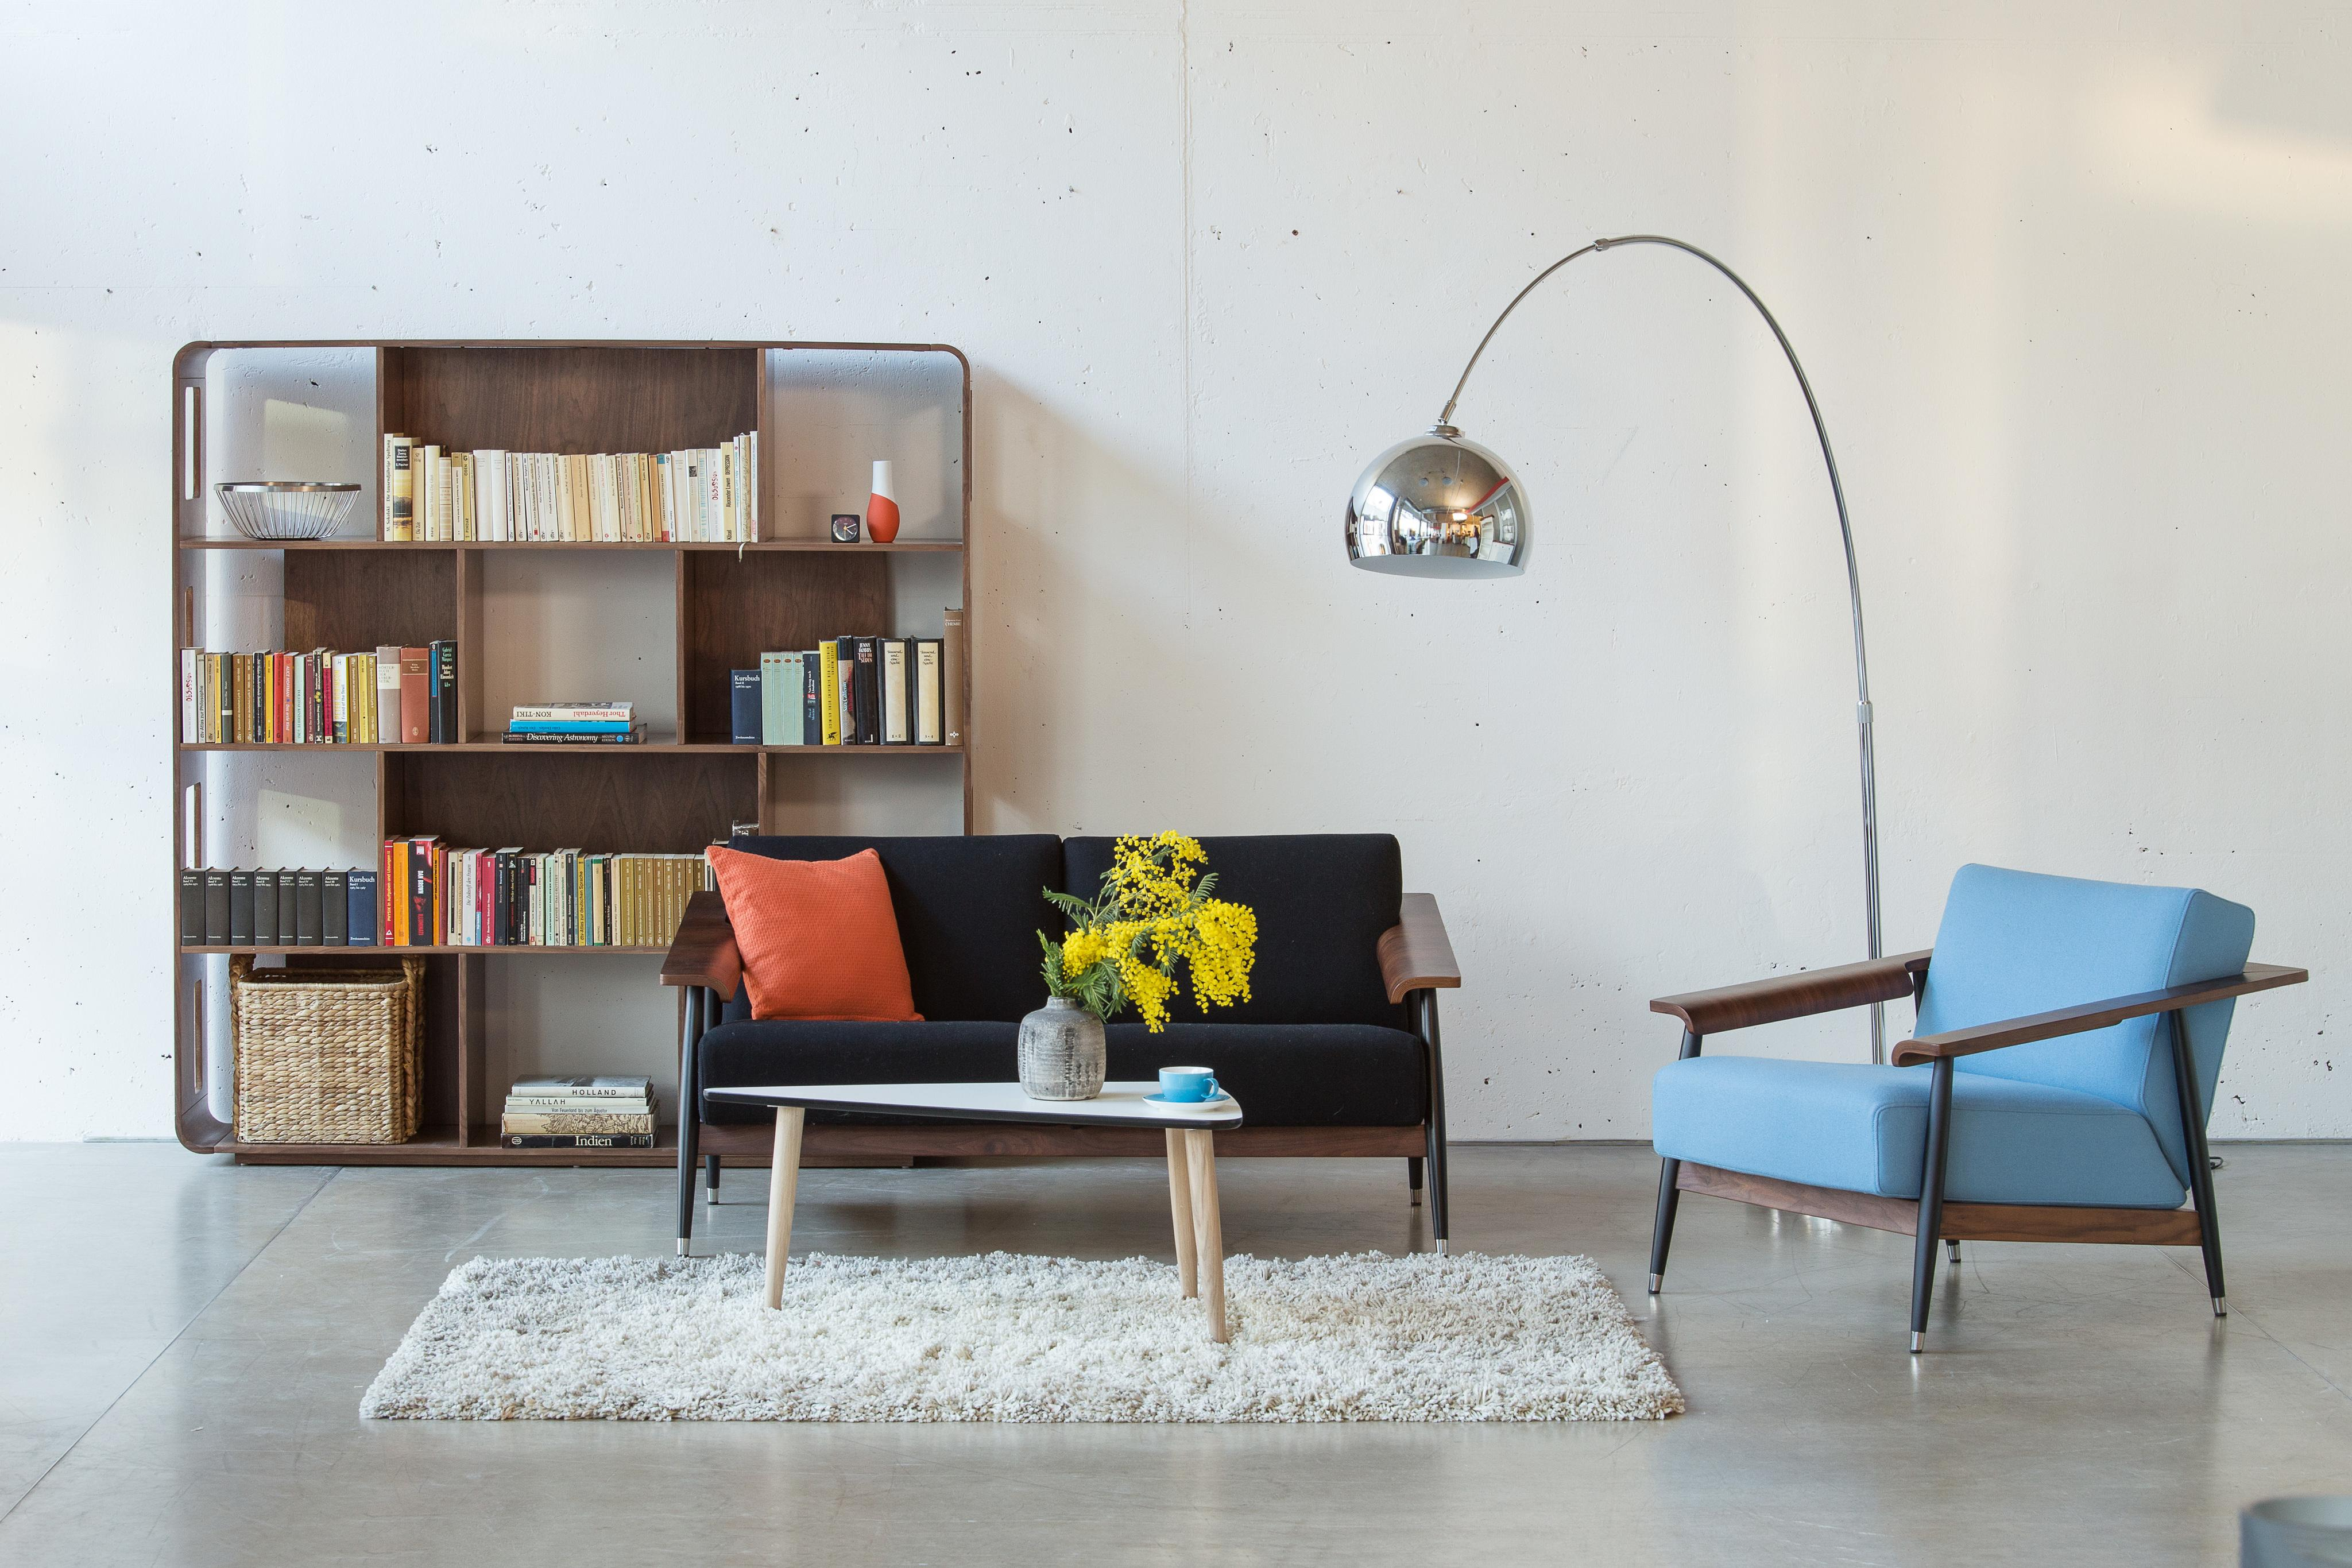 retro alles kommt zur ck couchtisch bogenlampe. Black Bedroom Furniture Sets. Home Design Ideas